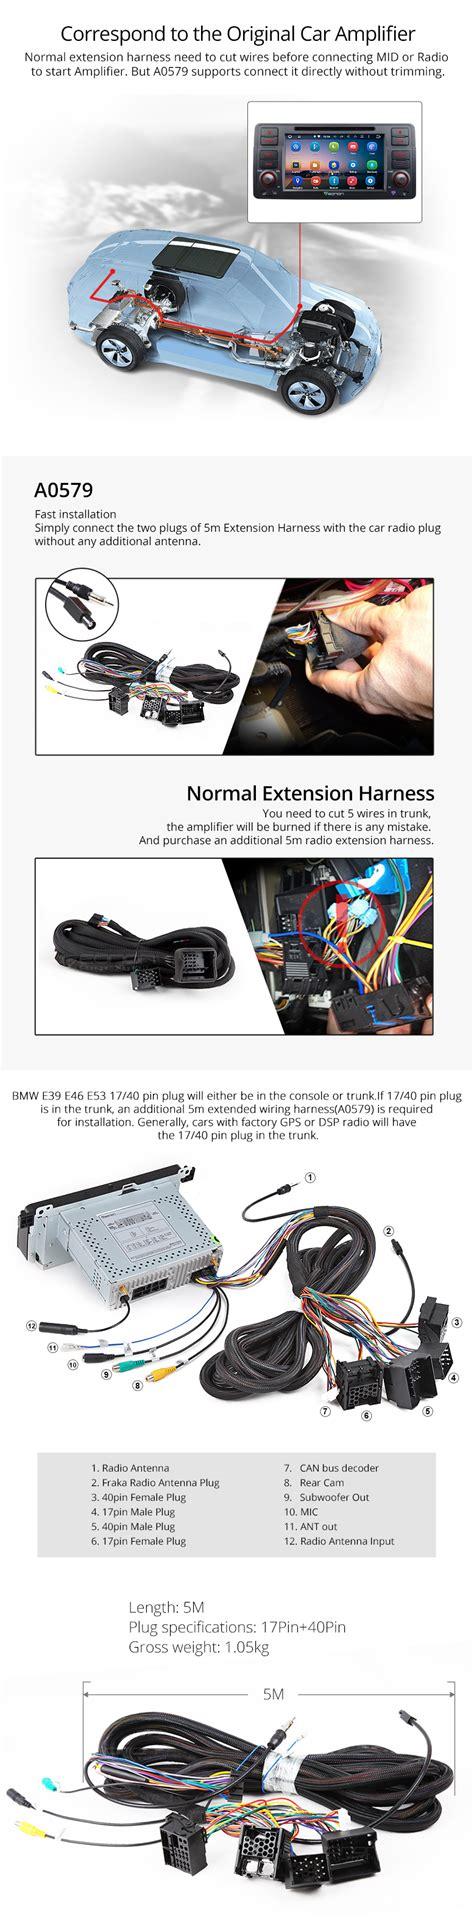 bmw e46 trunk wiring harness bmw e46 trunk wiring diagram